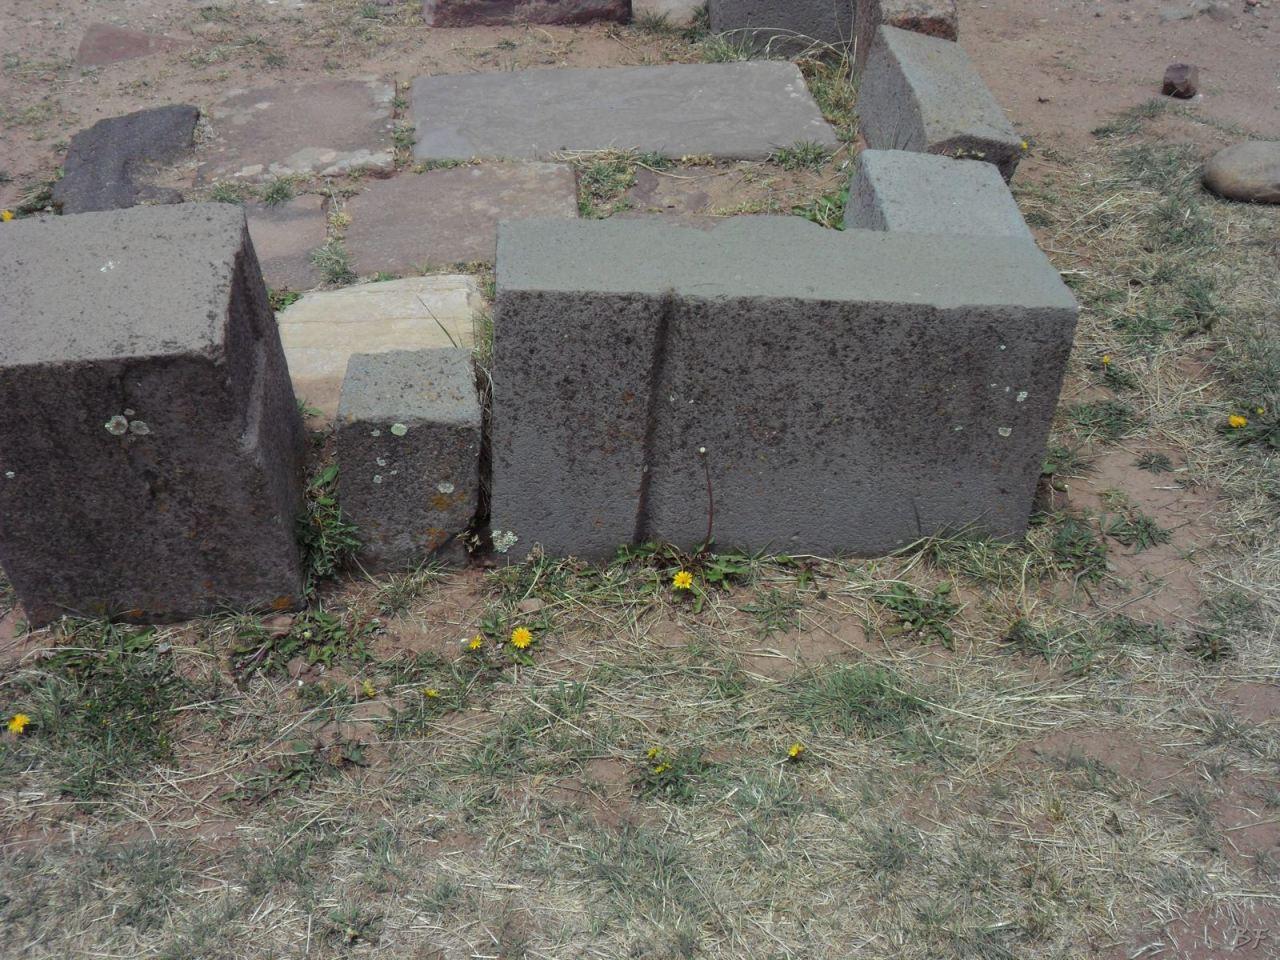 Sito-Megalitico-Piramide-Akapana-Kalasasaya-Menhir-Tiahuanaco-Bolivia-28